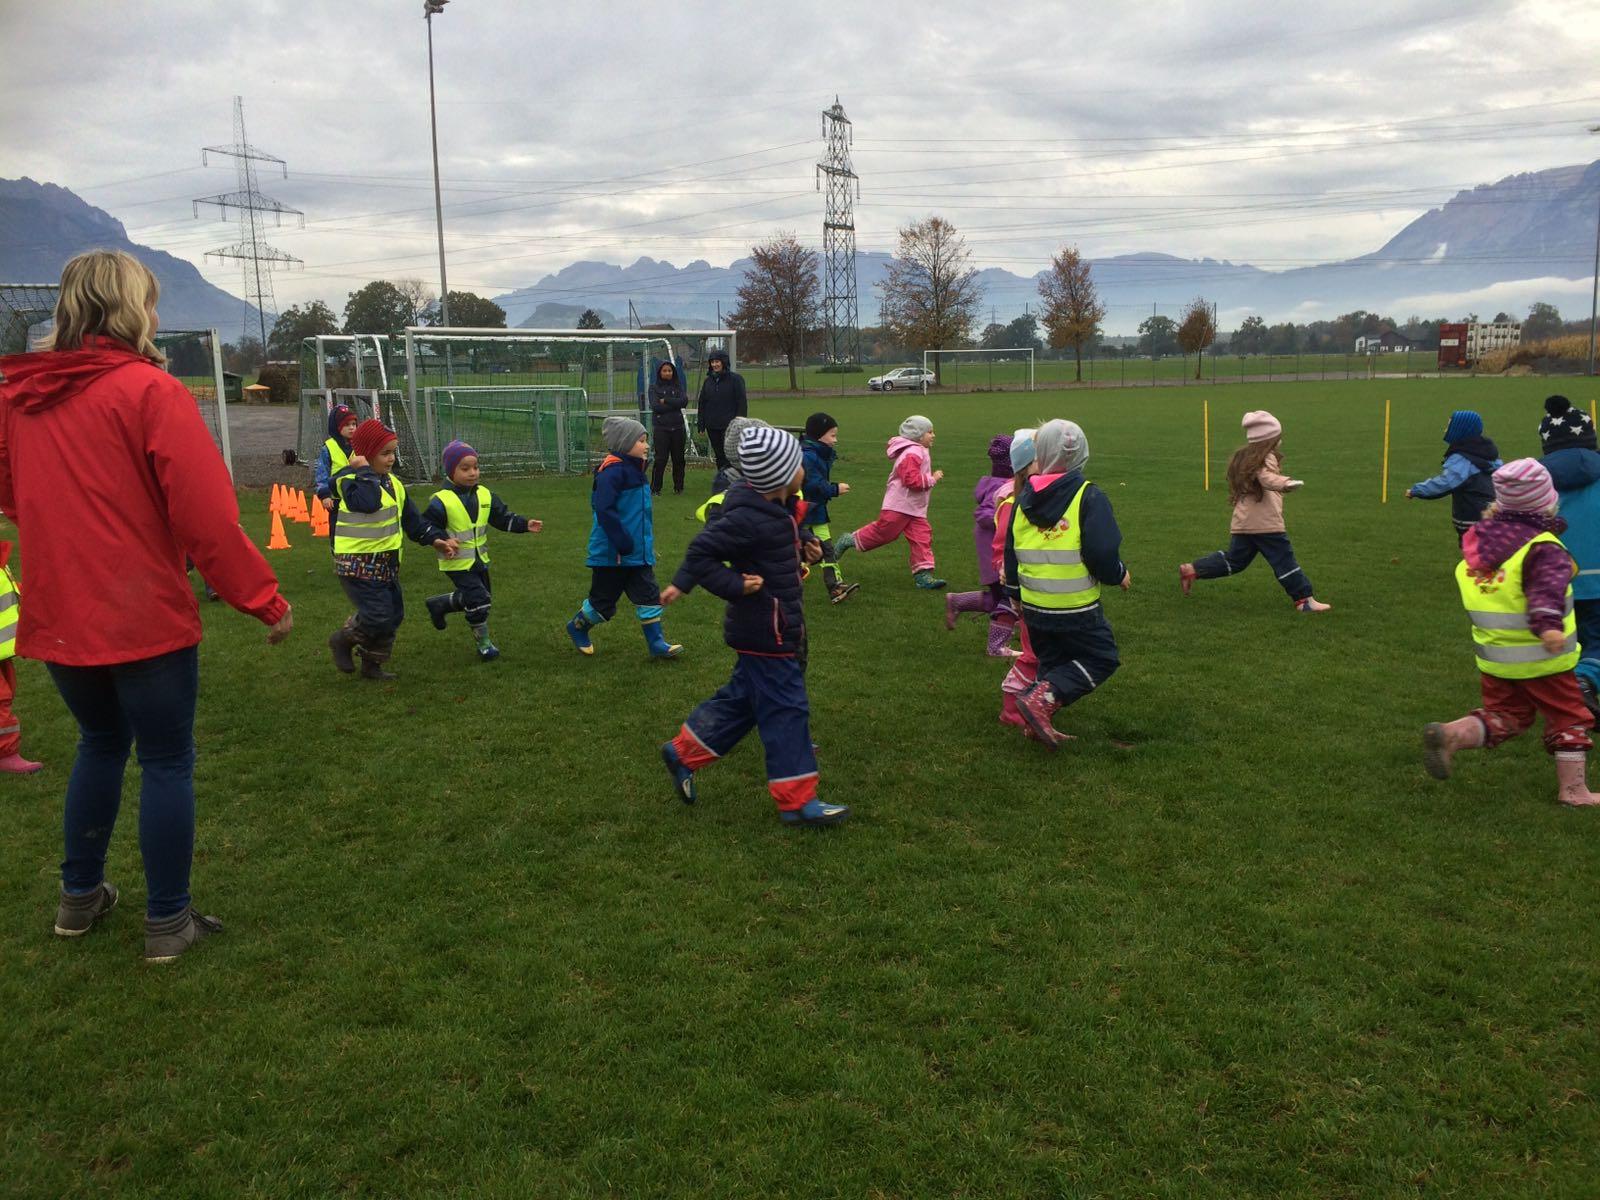 161025 SKB Kindergartentag Sportplatz Fotos v Heike GUEM (15).jpg